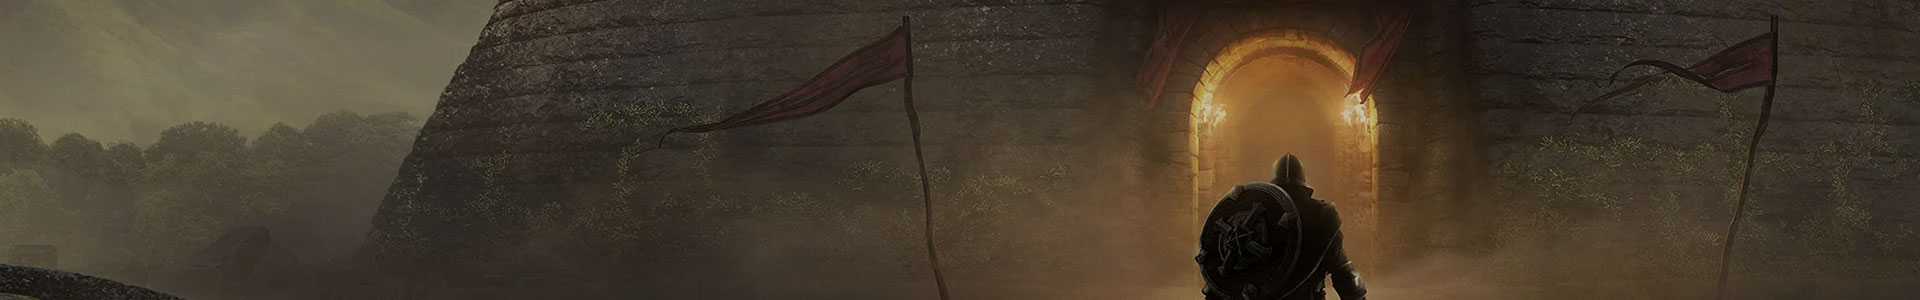 Banner media of The Elder Scrolls: Blades video game.